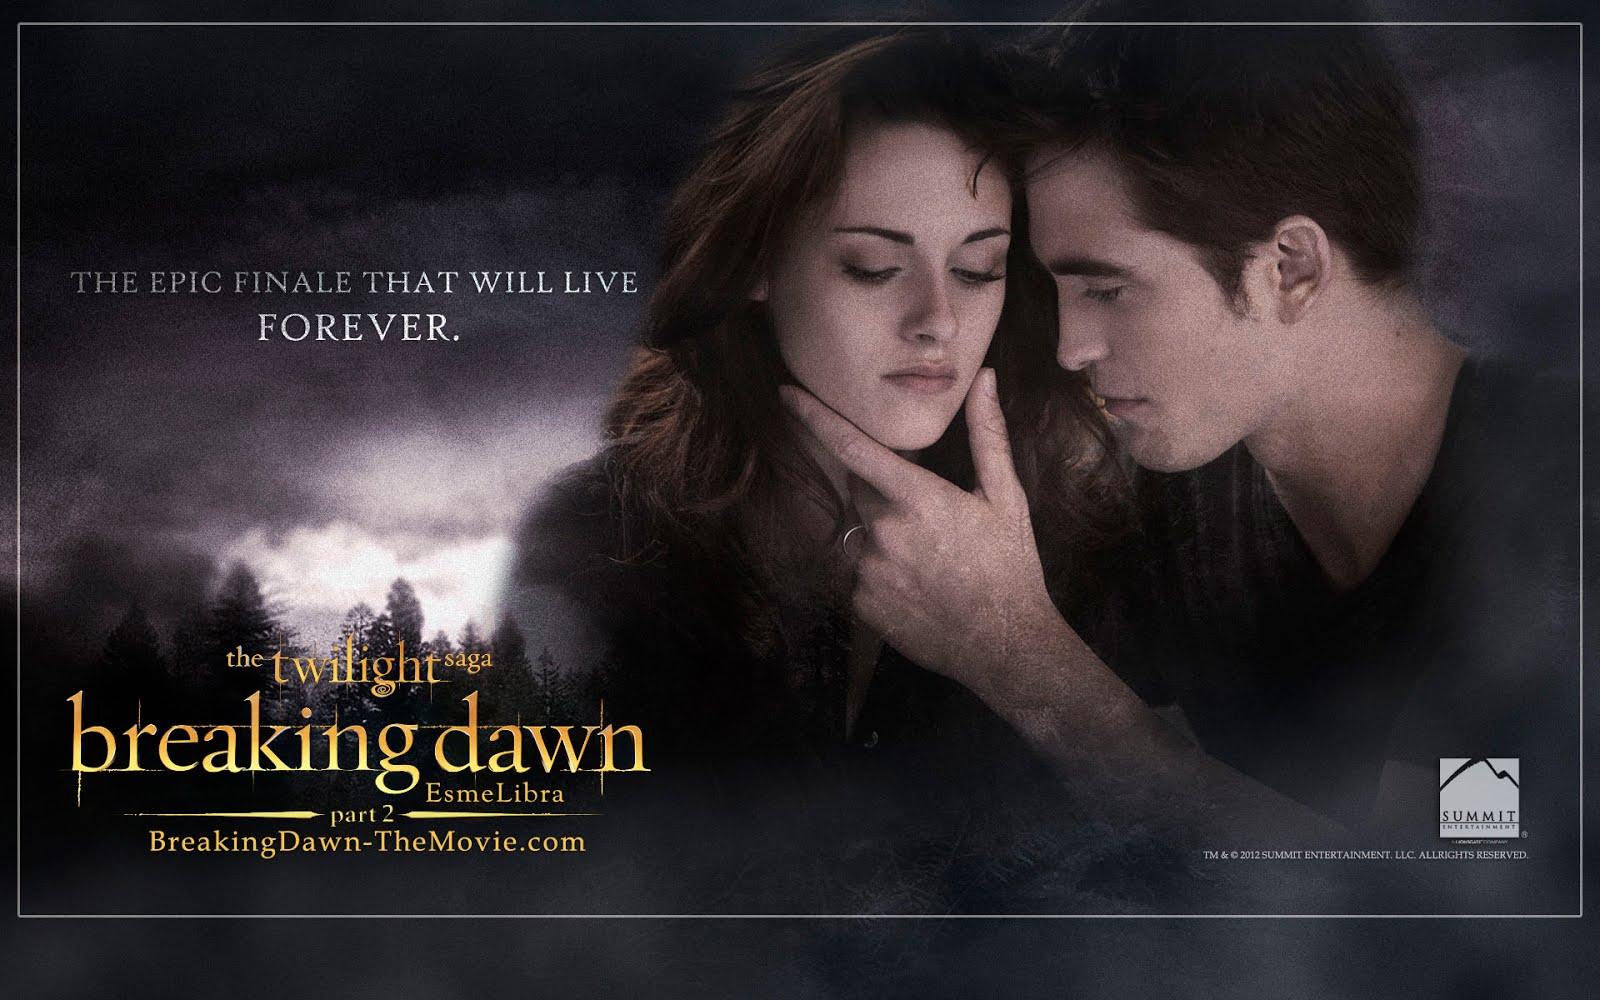 Fans twilight saga 4 new 39 breaking dawn part 2 39 desktop - Twilight breaking dawn wallpaper ...